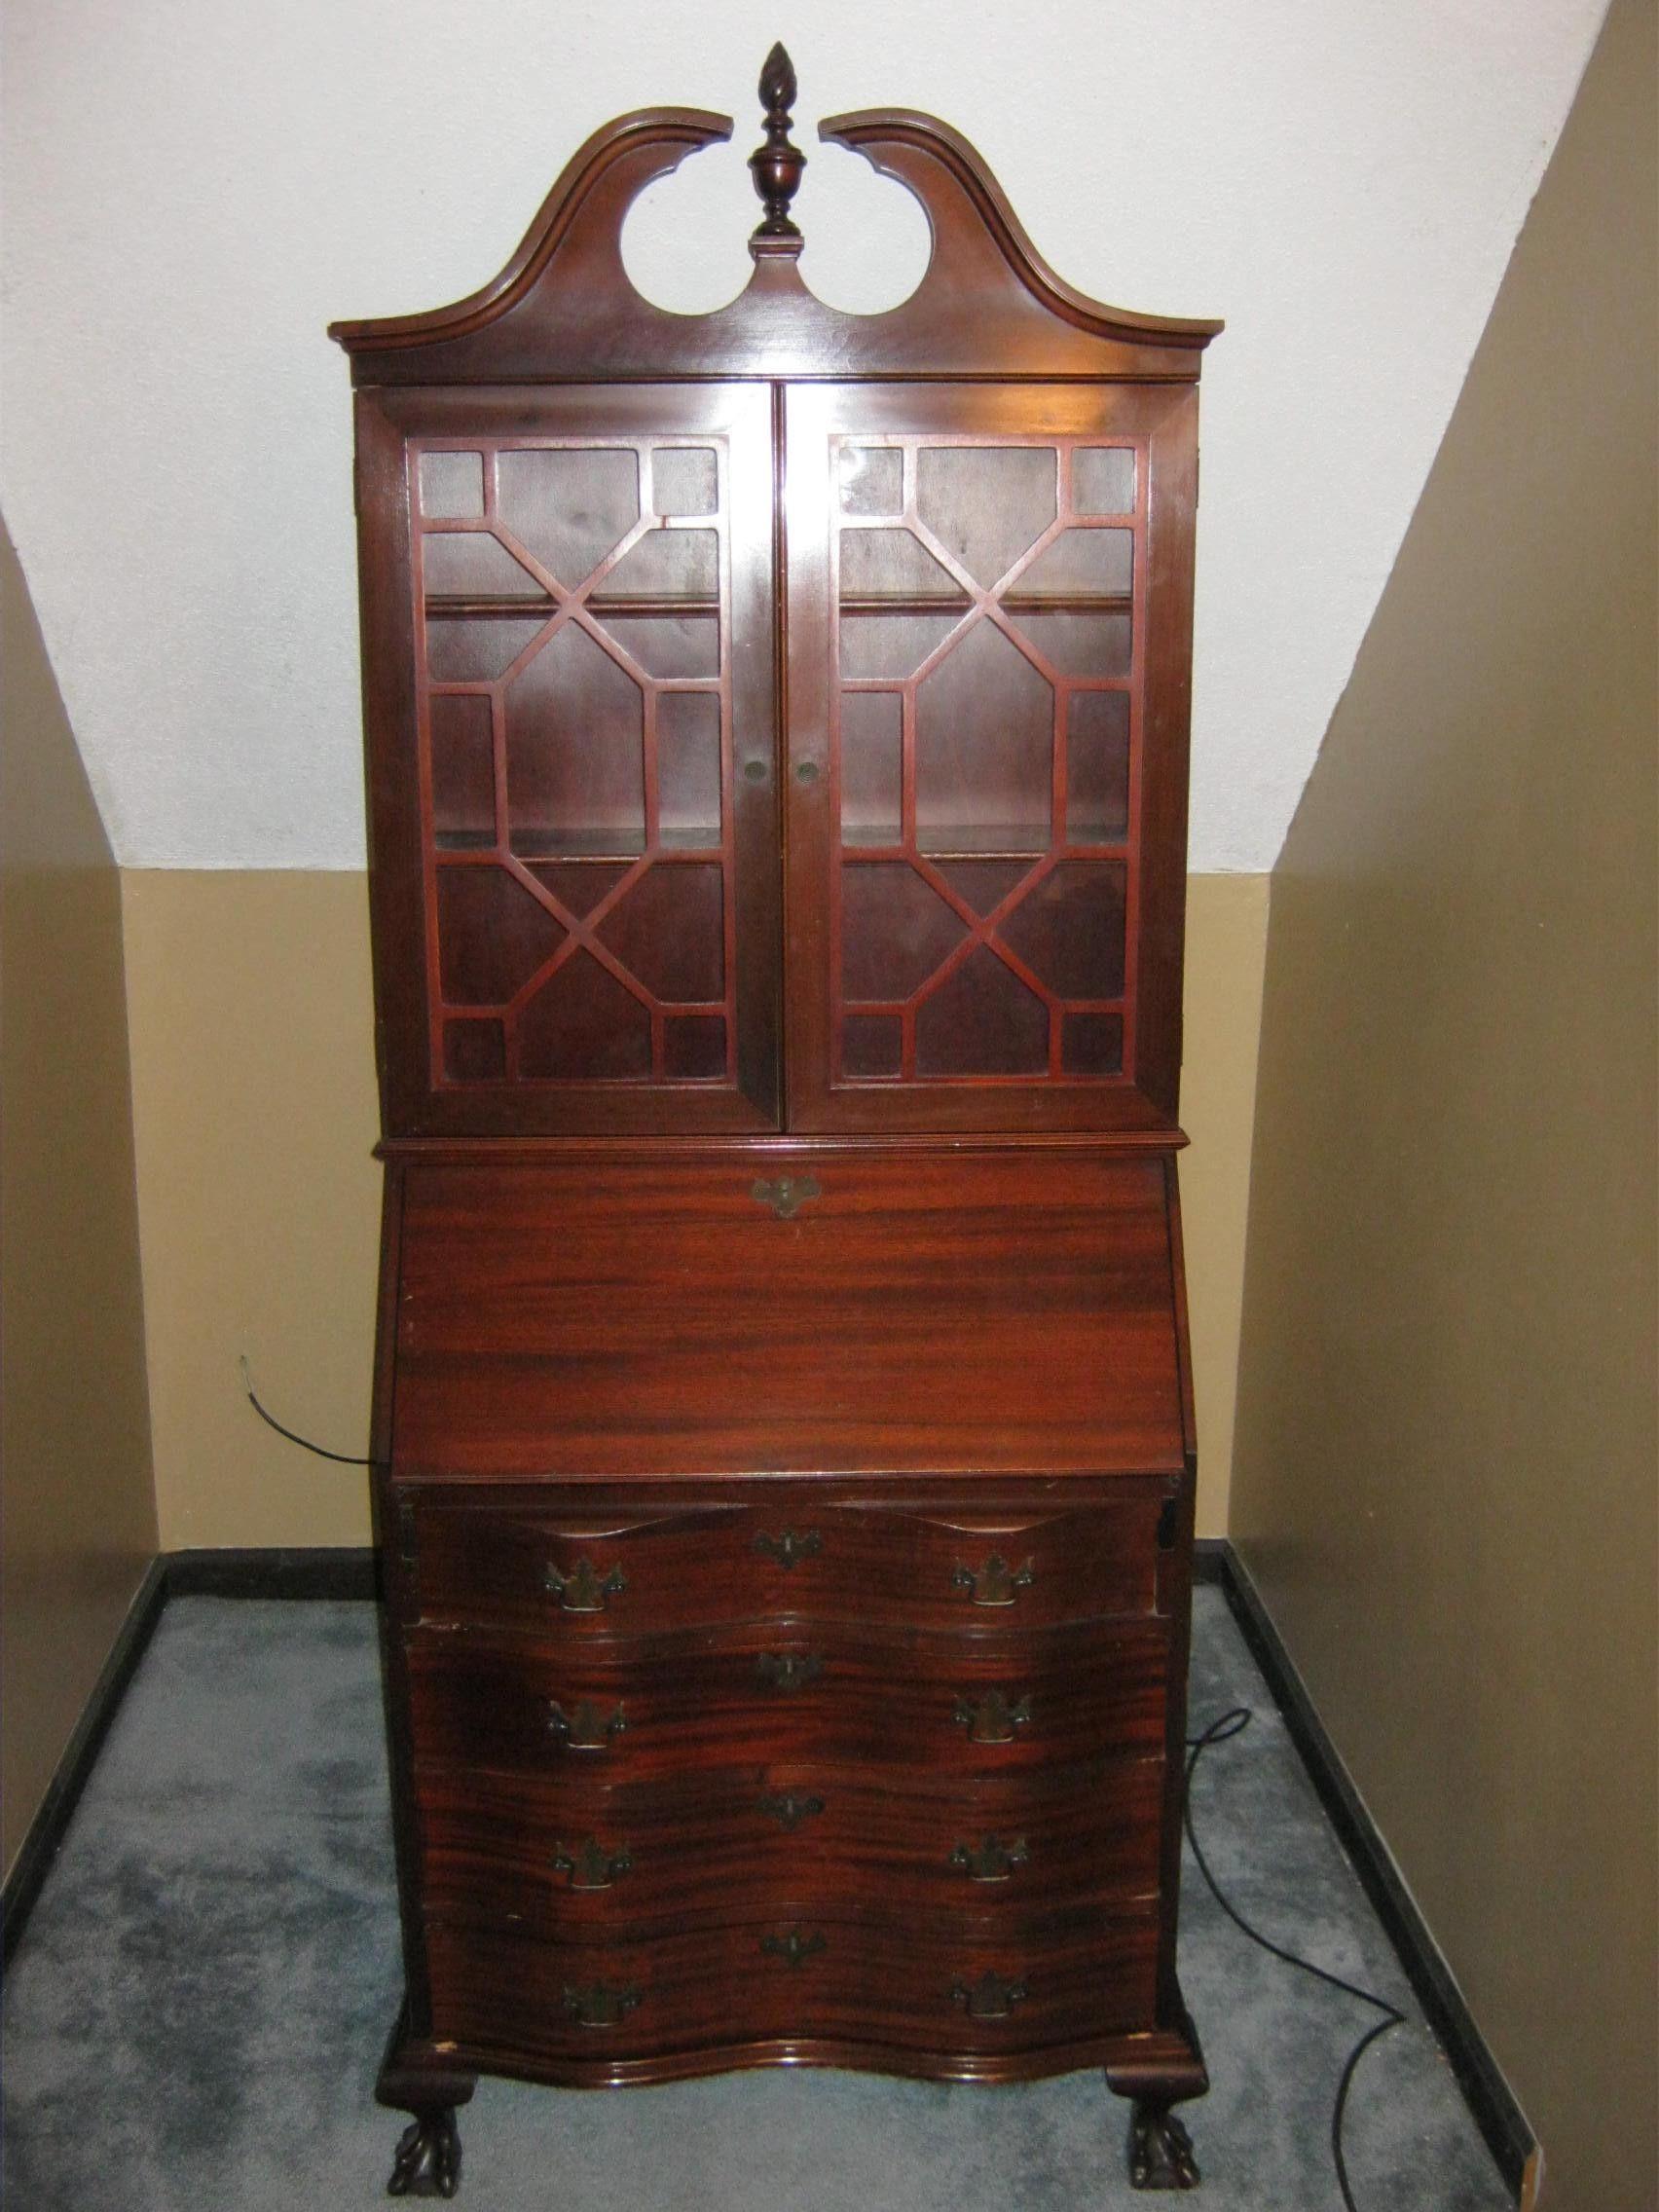 furniture with desk interior sale for remodel receptionist excellent home desks ideas top designing about on